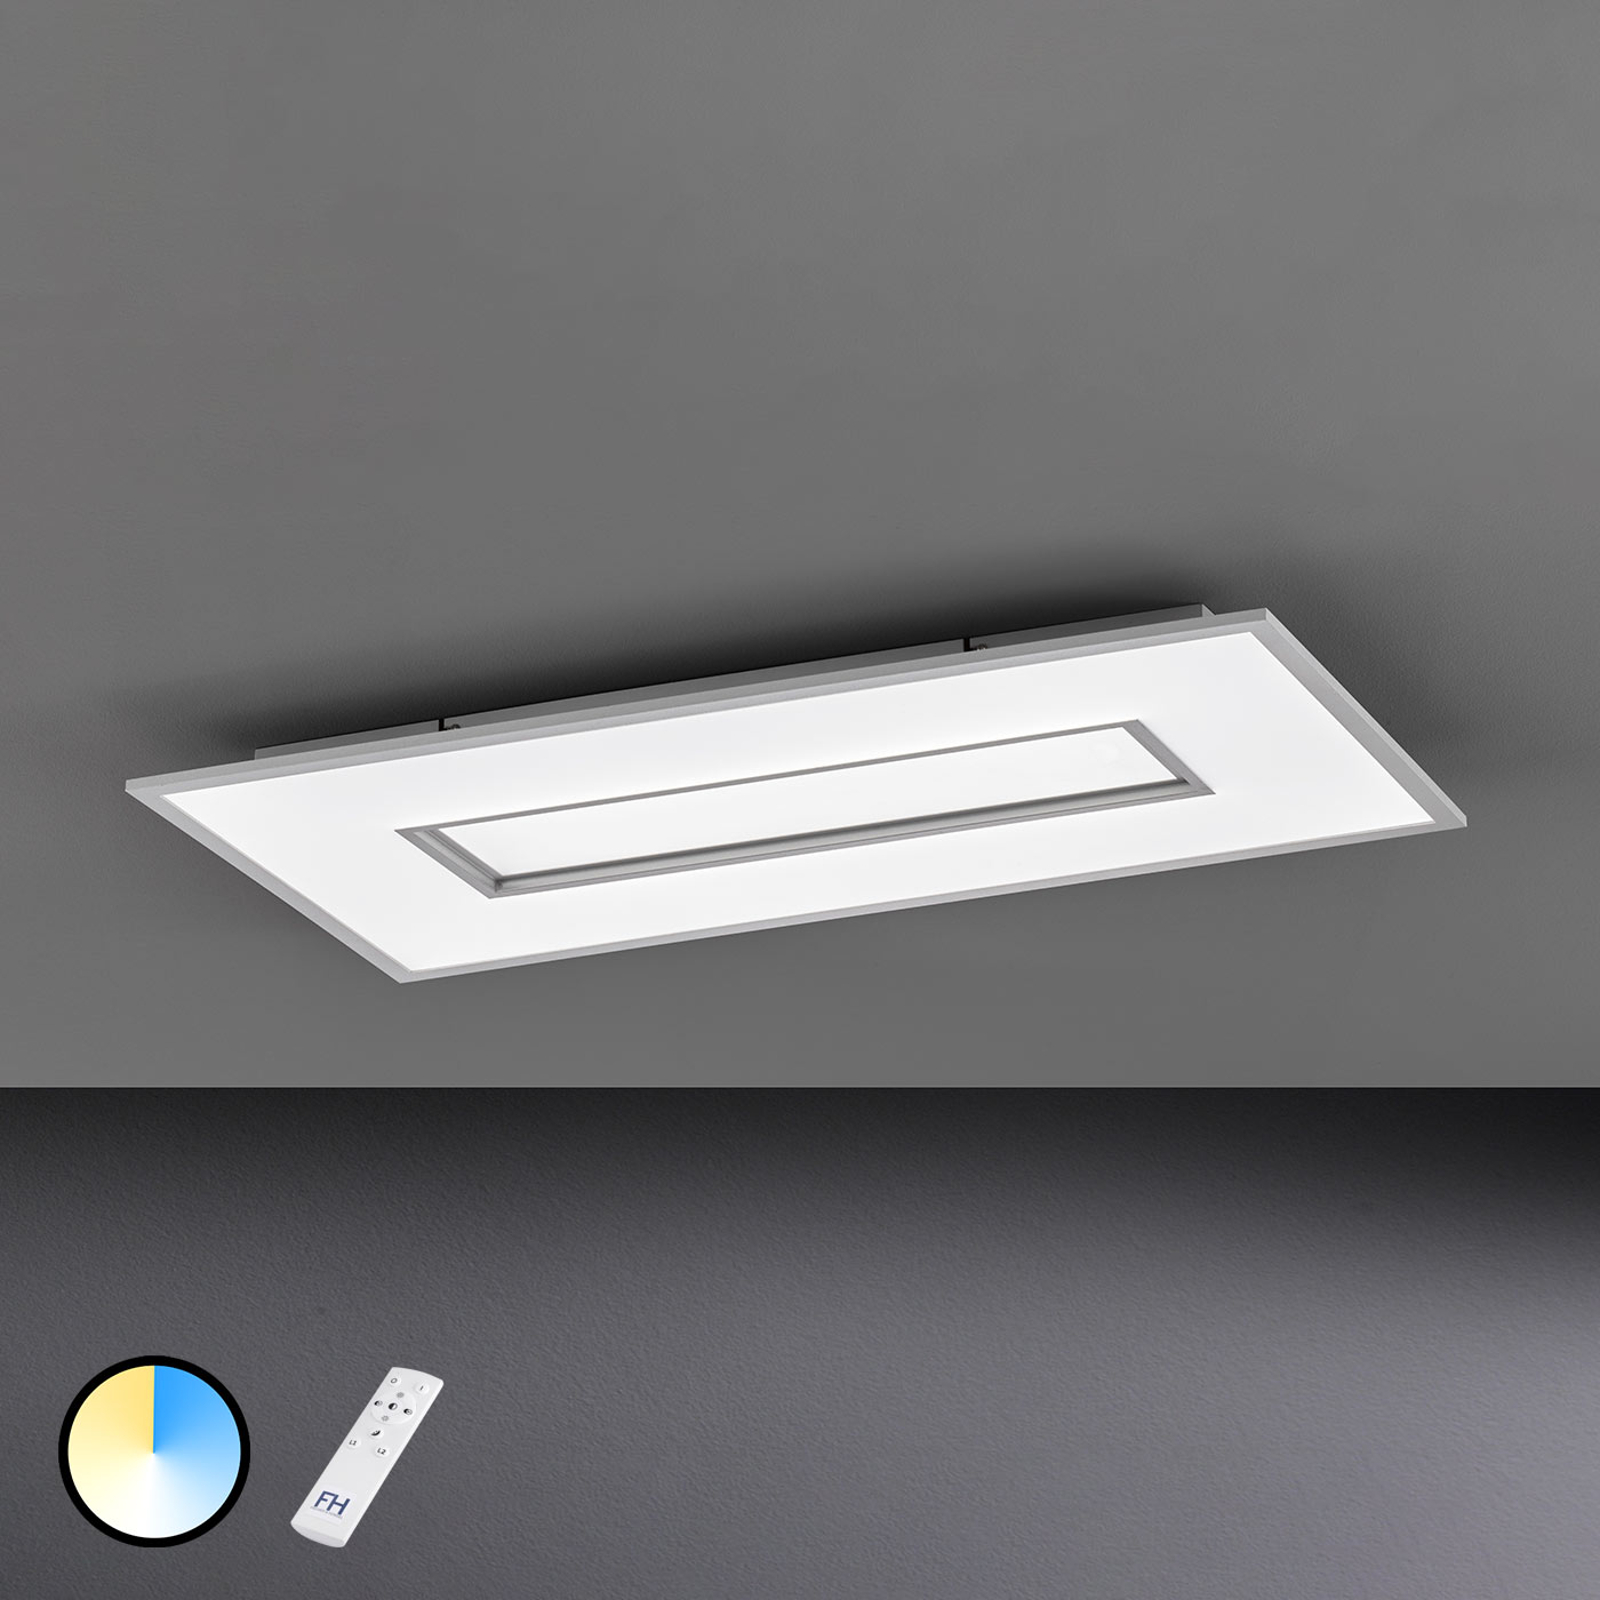 Plafoniera LED Tiara rettangolare 80x40 cm